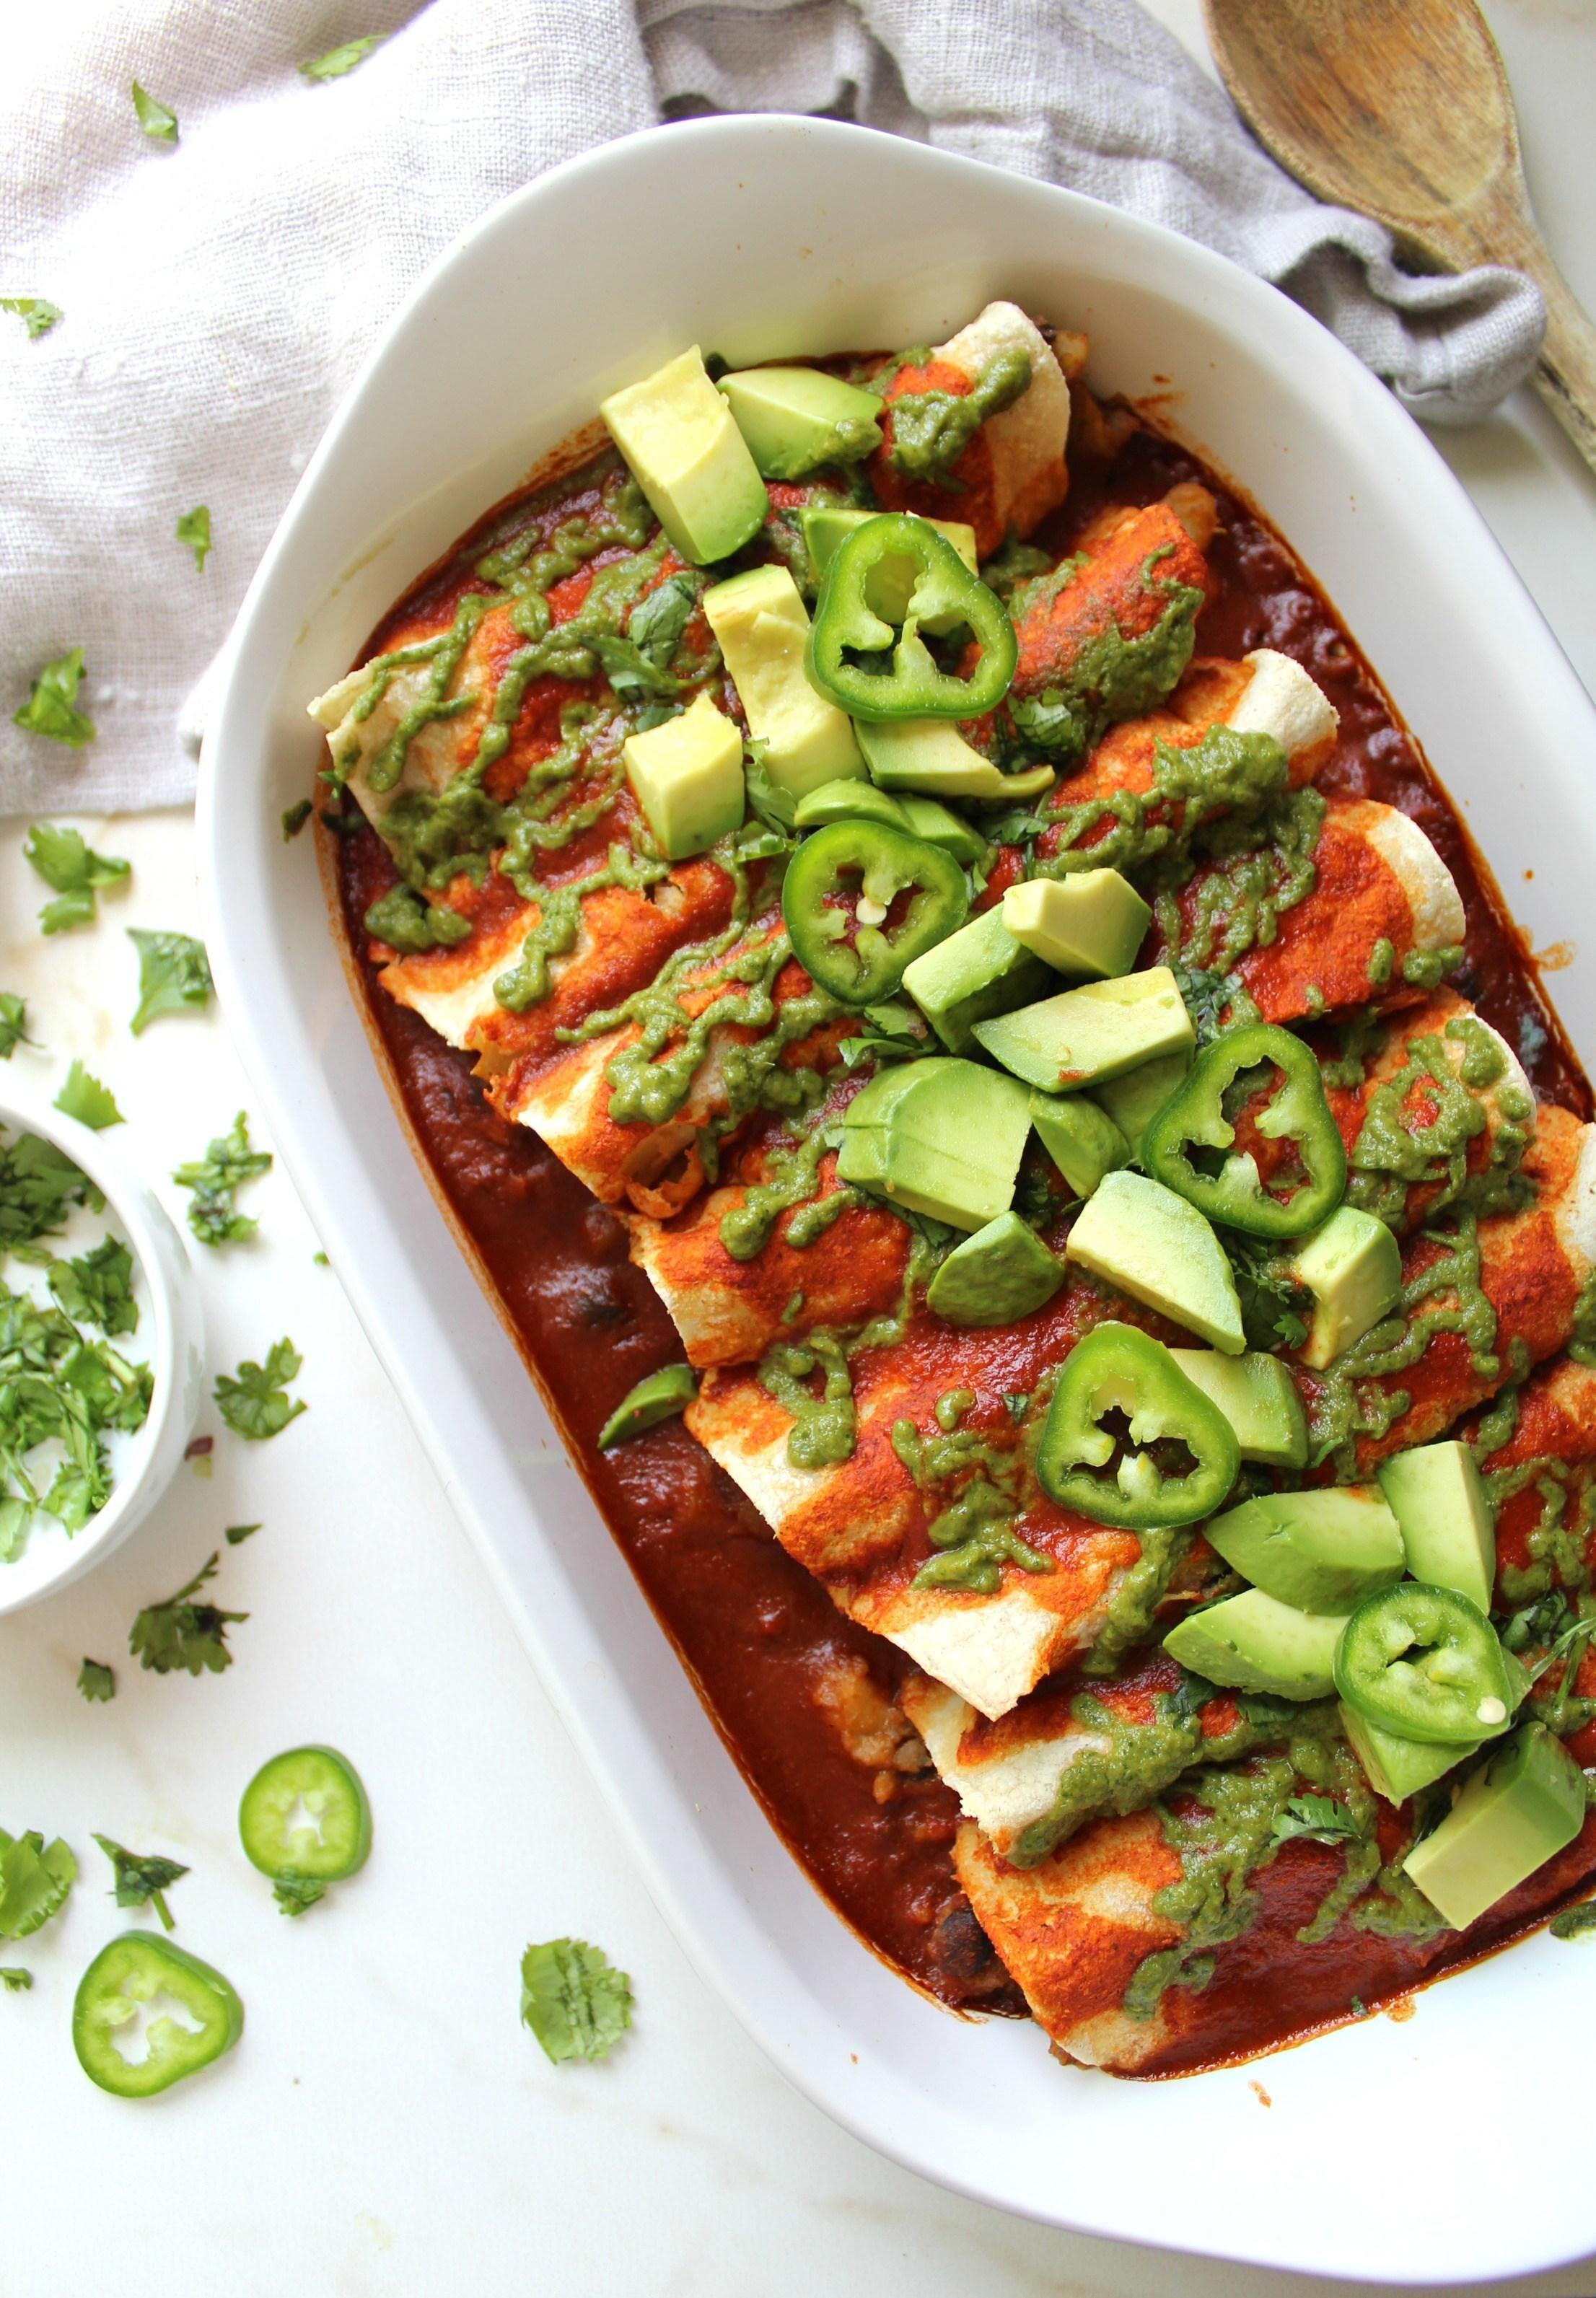 Enchiladas de frijol en salsa roja